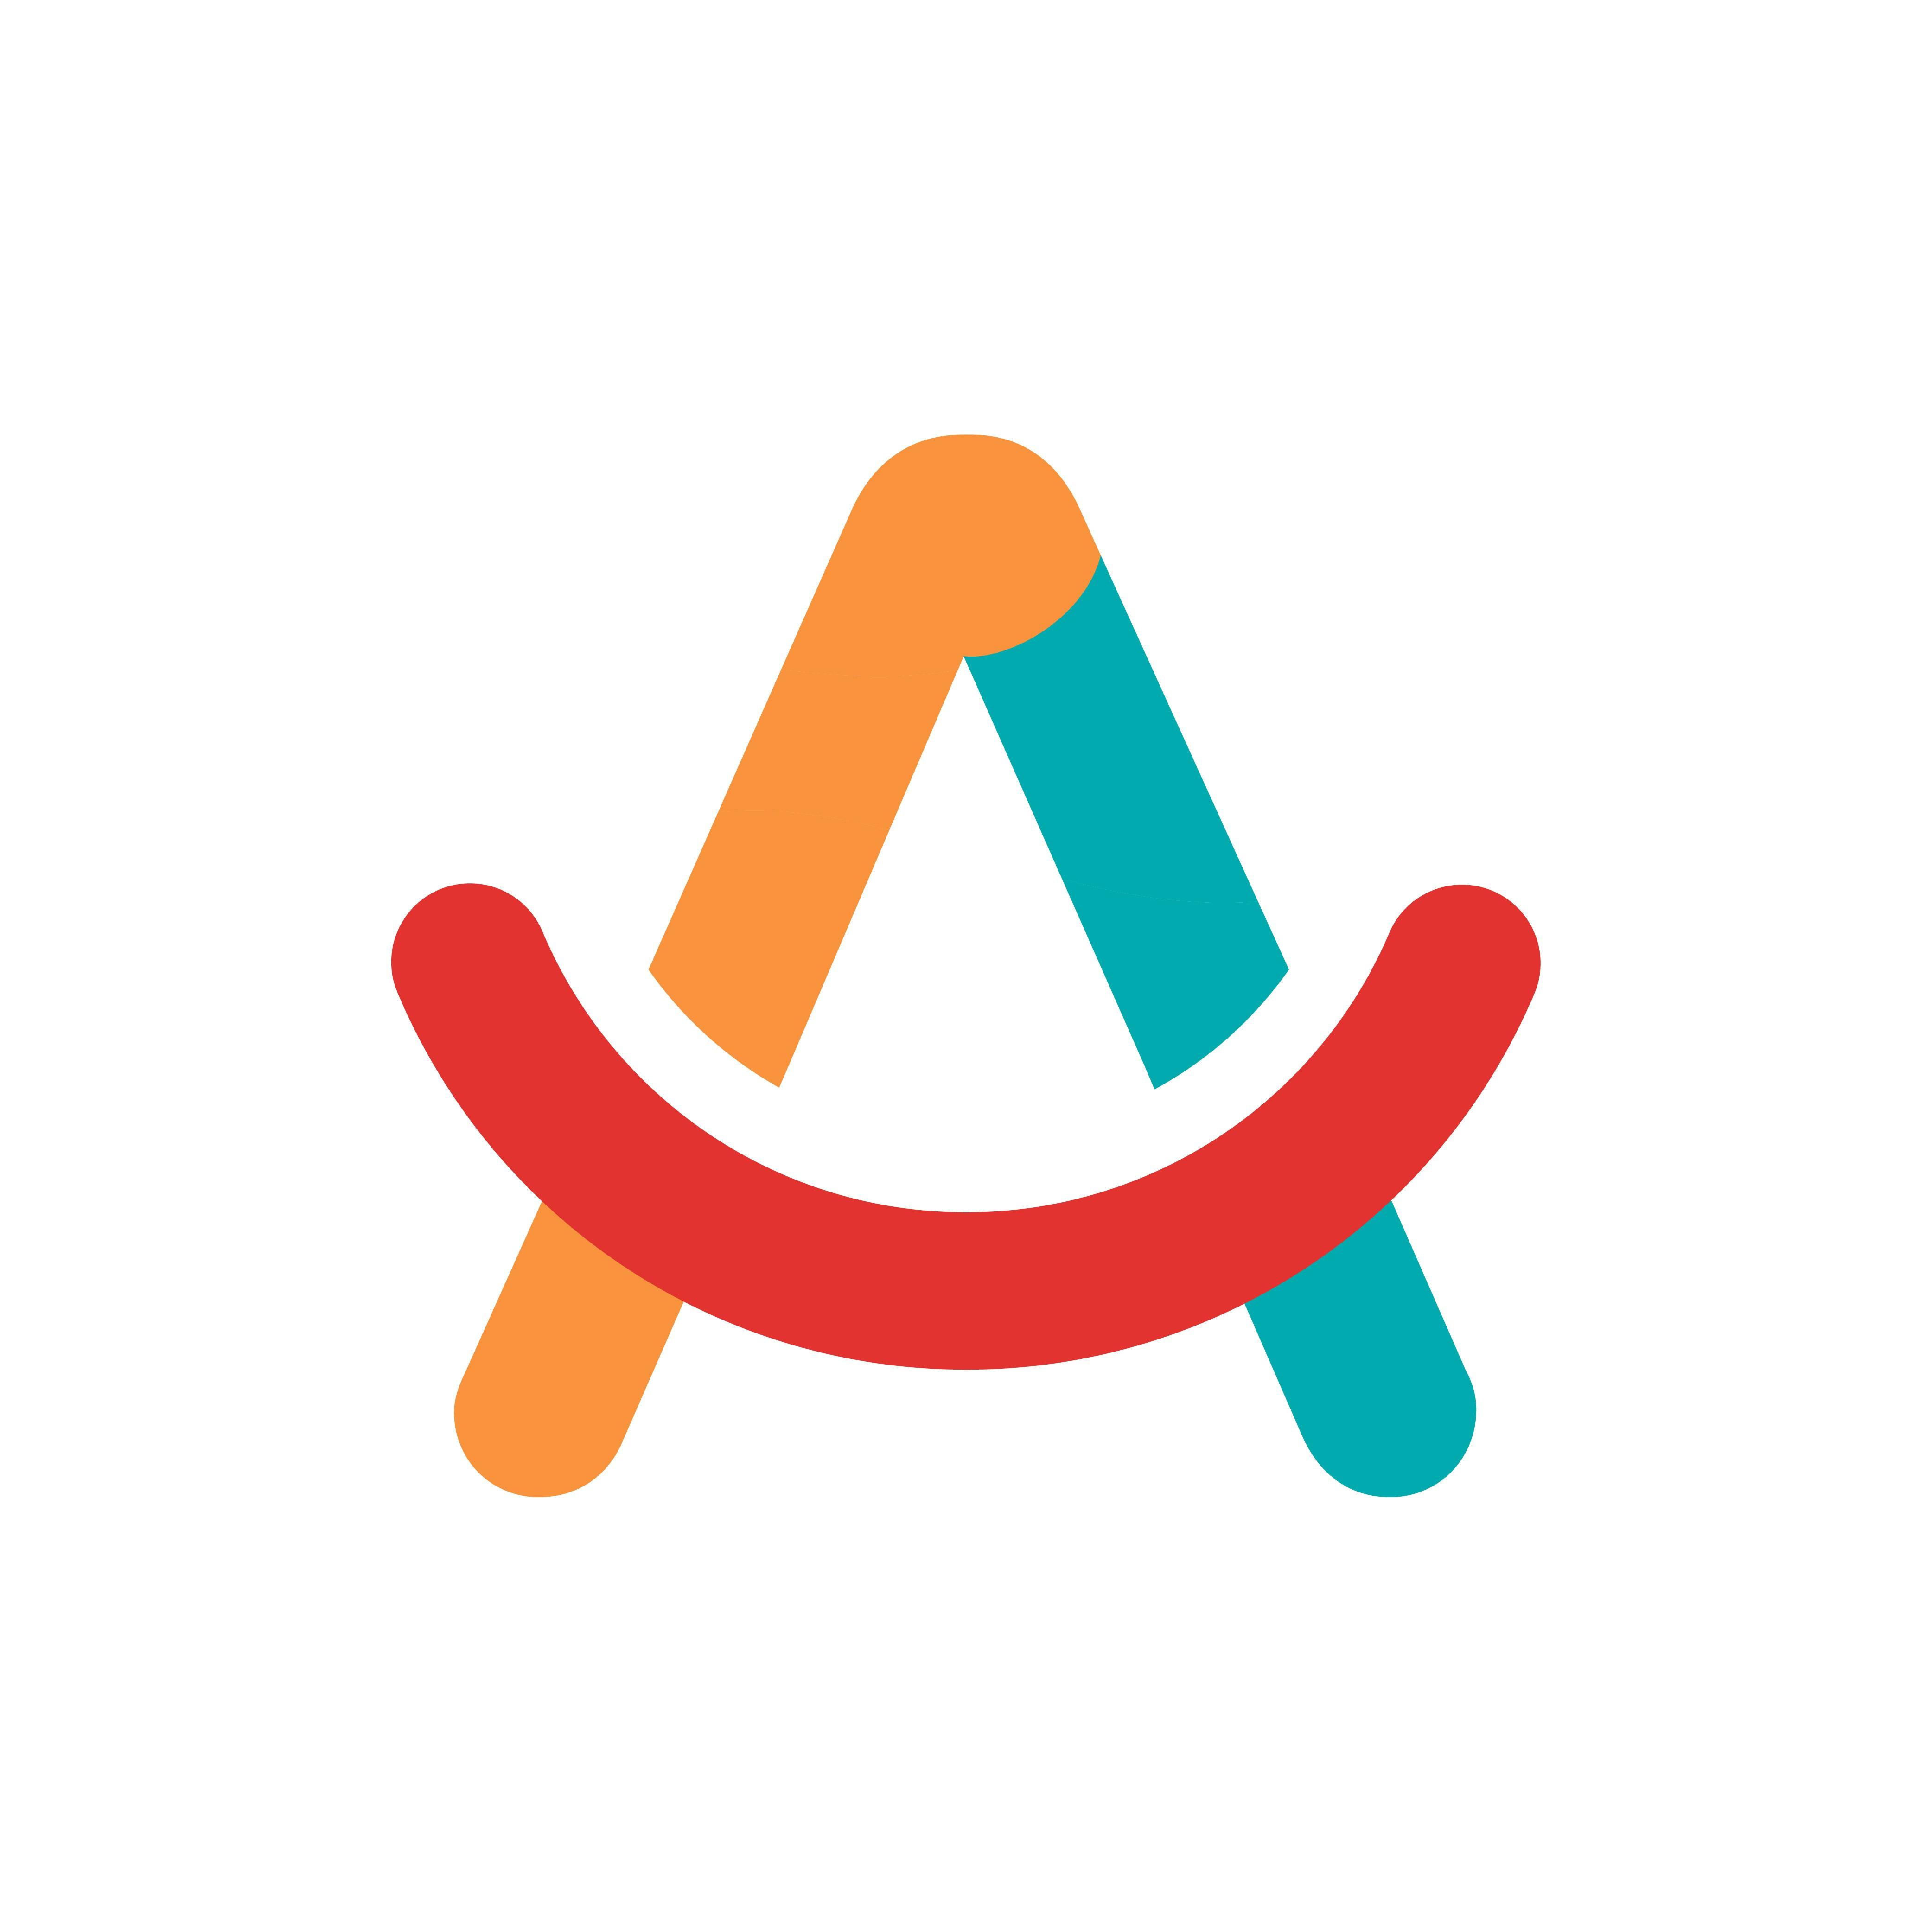 New kids class locator app needs fresh, fun and creative logo and web design.